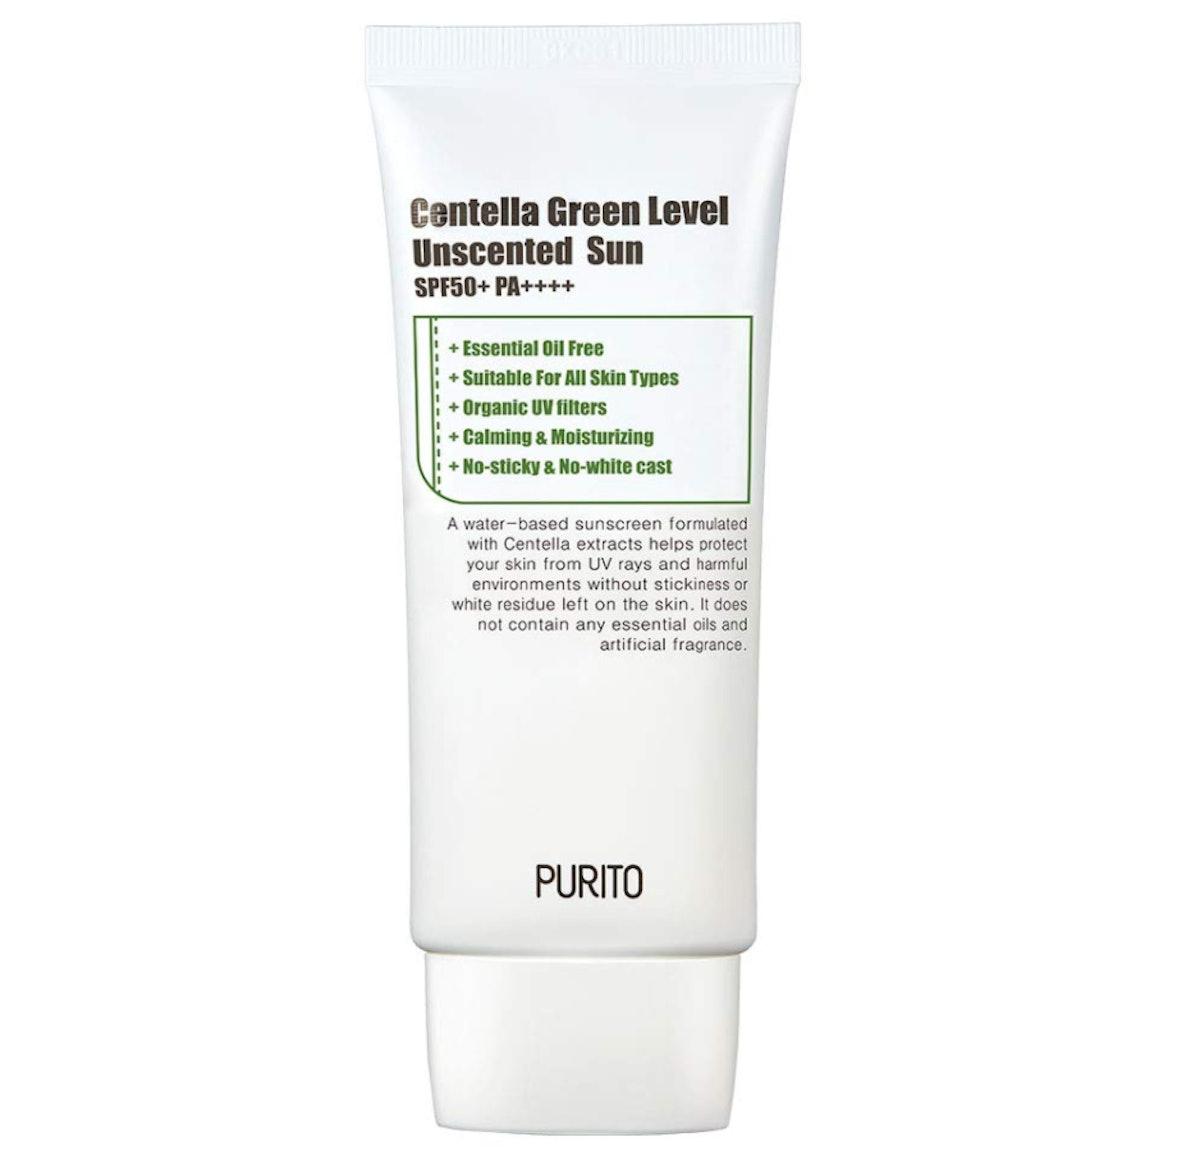 Centella Green Level Unscented Sun SPF50